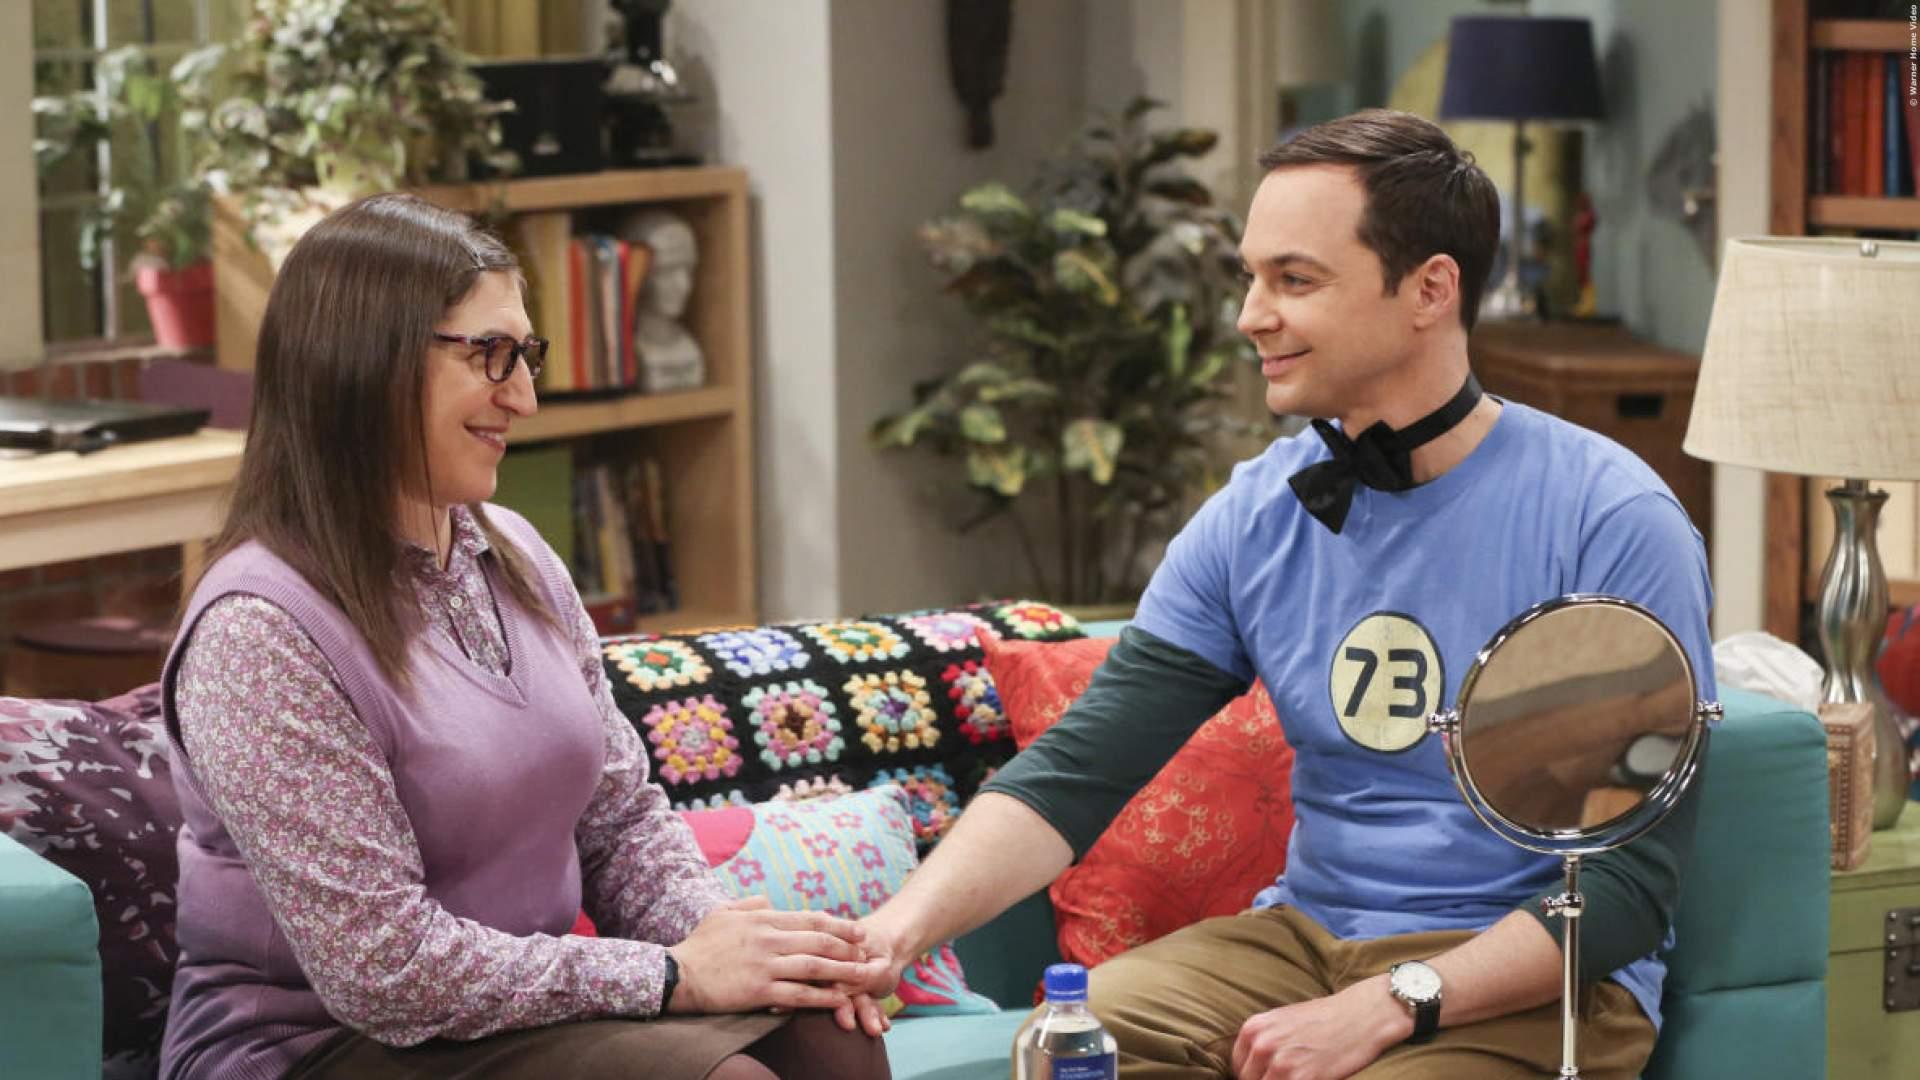 NACHSCHUB: 'The Big Bang Theory'-Macher dreht neue Sitcom - Darum geht's